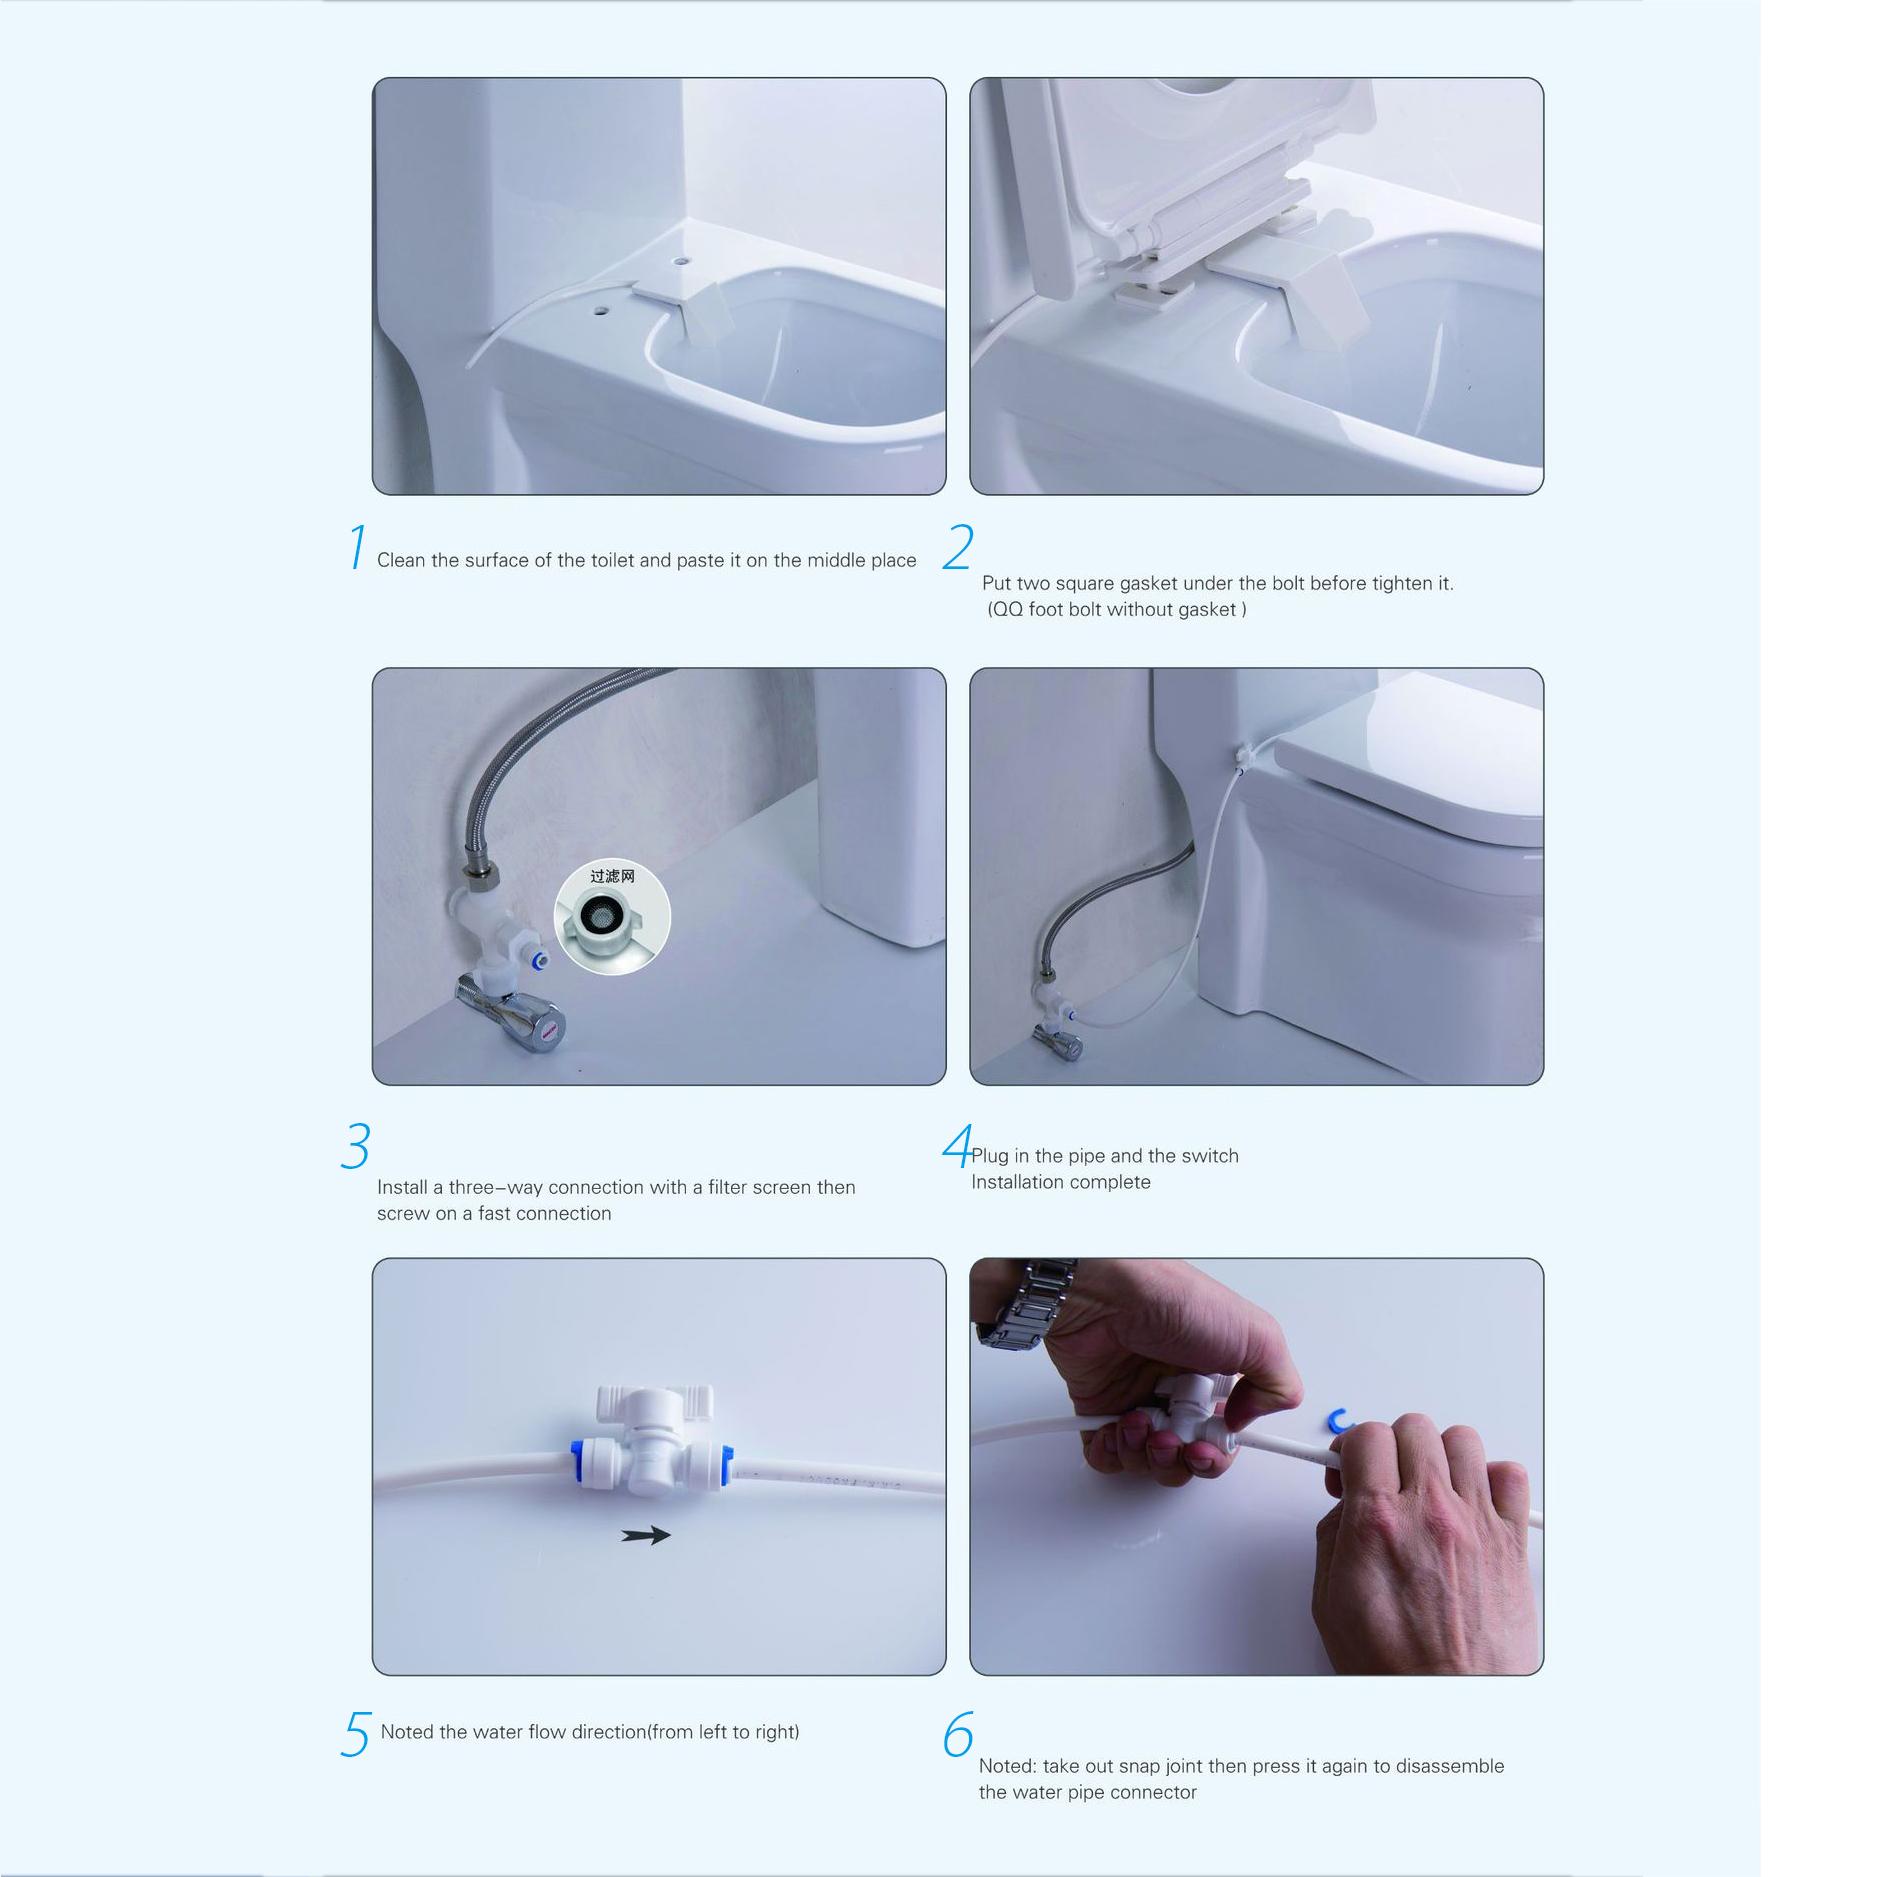 WC Toilet Seat Sanitärgerät Bidet Sprüher Intelligentes Waschen Smart Nozzle Neu